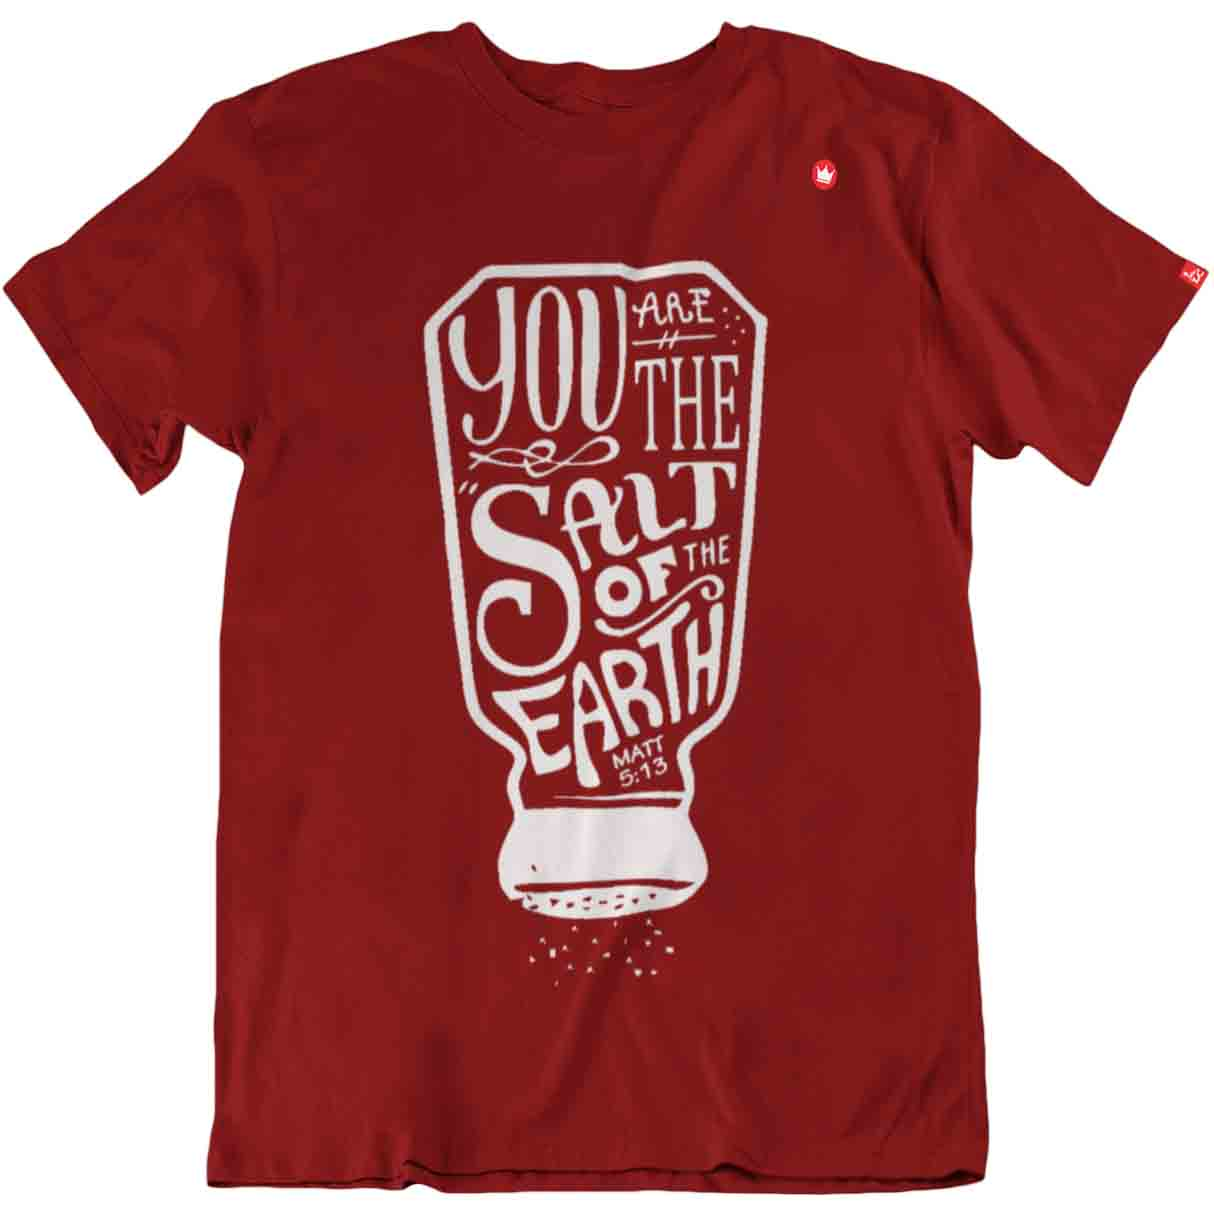 0cfa54dfd Camiseta Sal da terra e luz do mundo